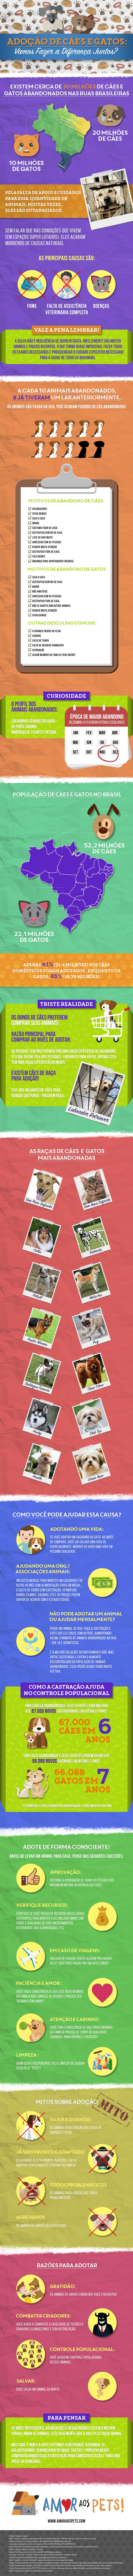 adotar um cachorro 7